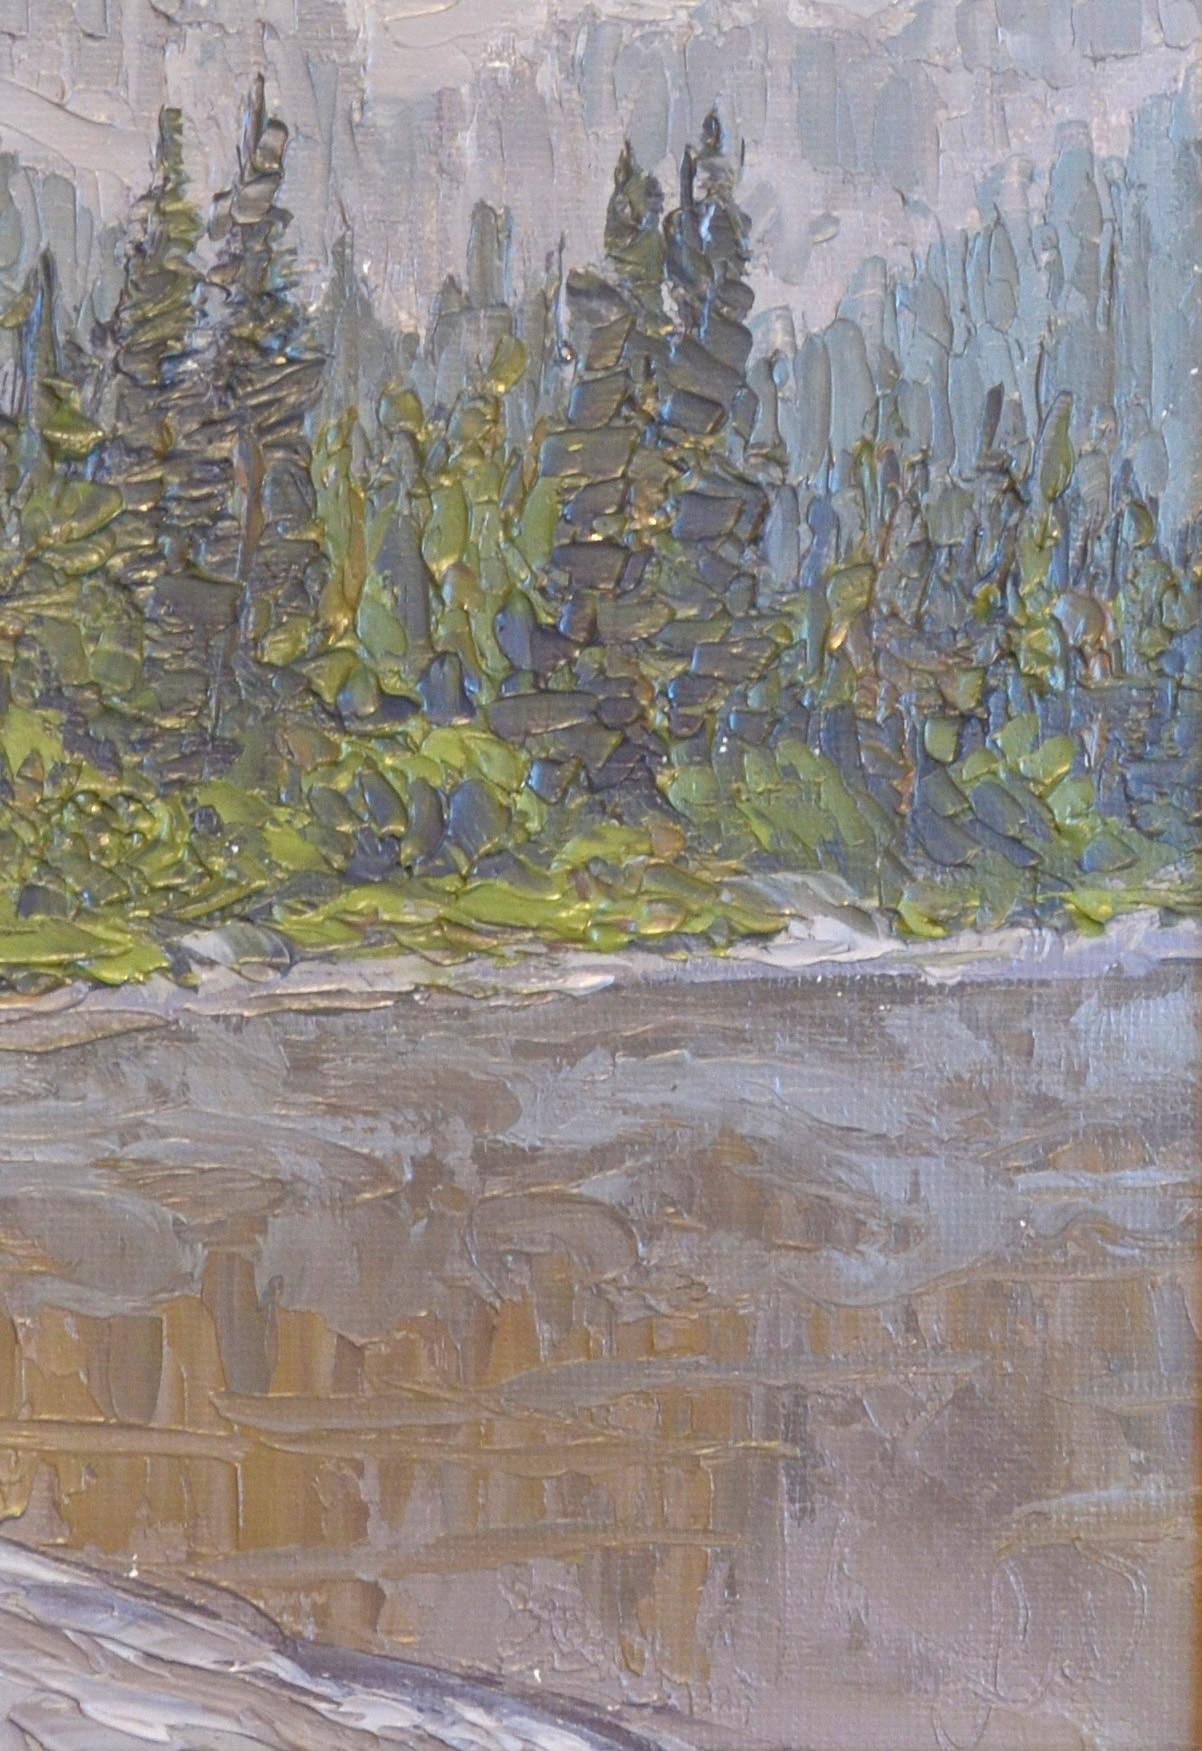 Foggy Lake - 5x7 - Oil on Canvas